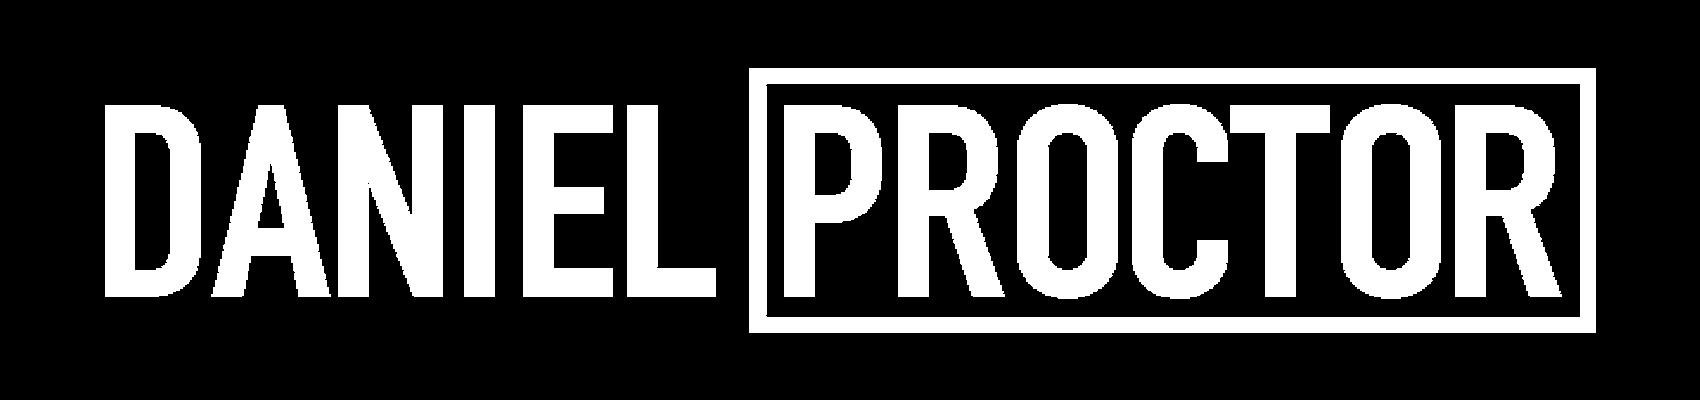 Official Daniel Proctor